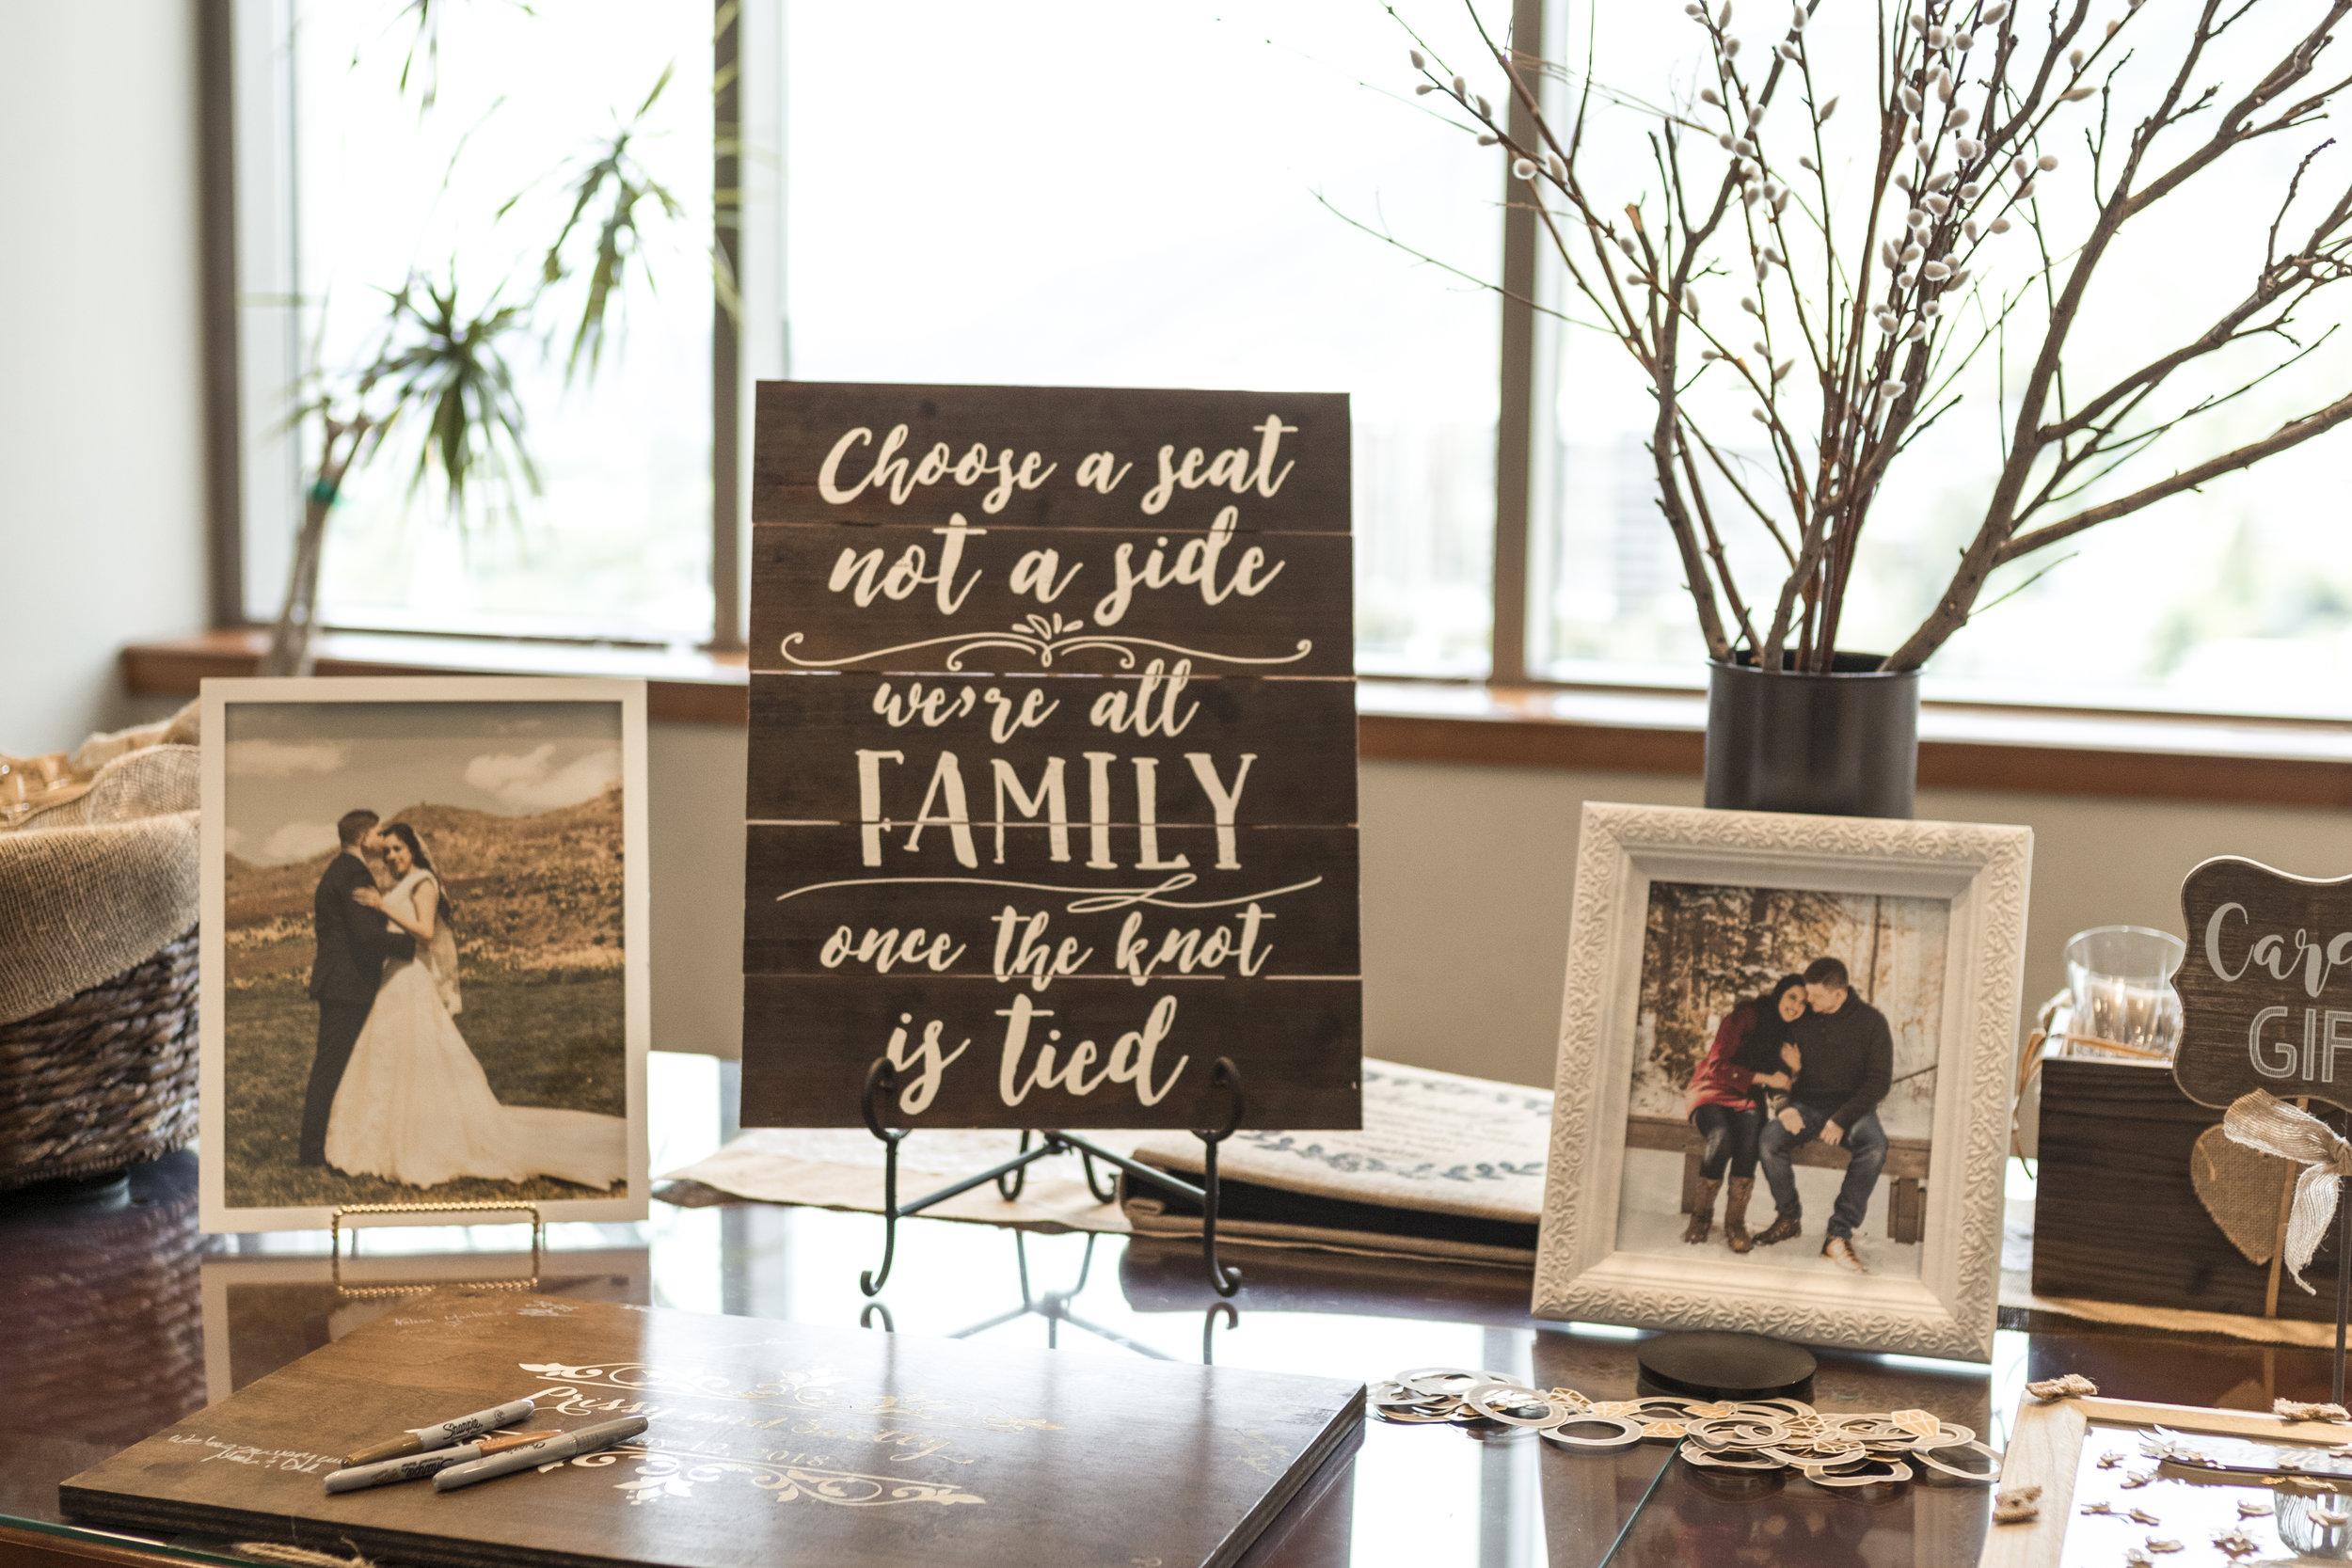 Utah Spring Wedding Reception in the Zions Bank Founders Room by Bri Bergman Photography04.JPG